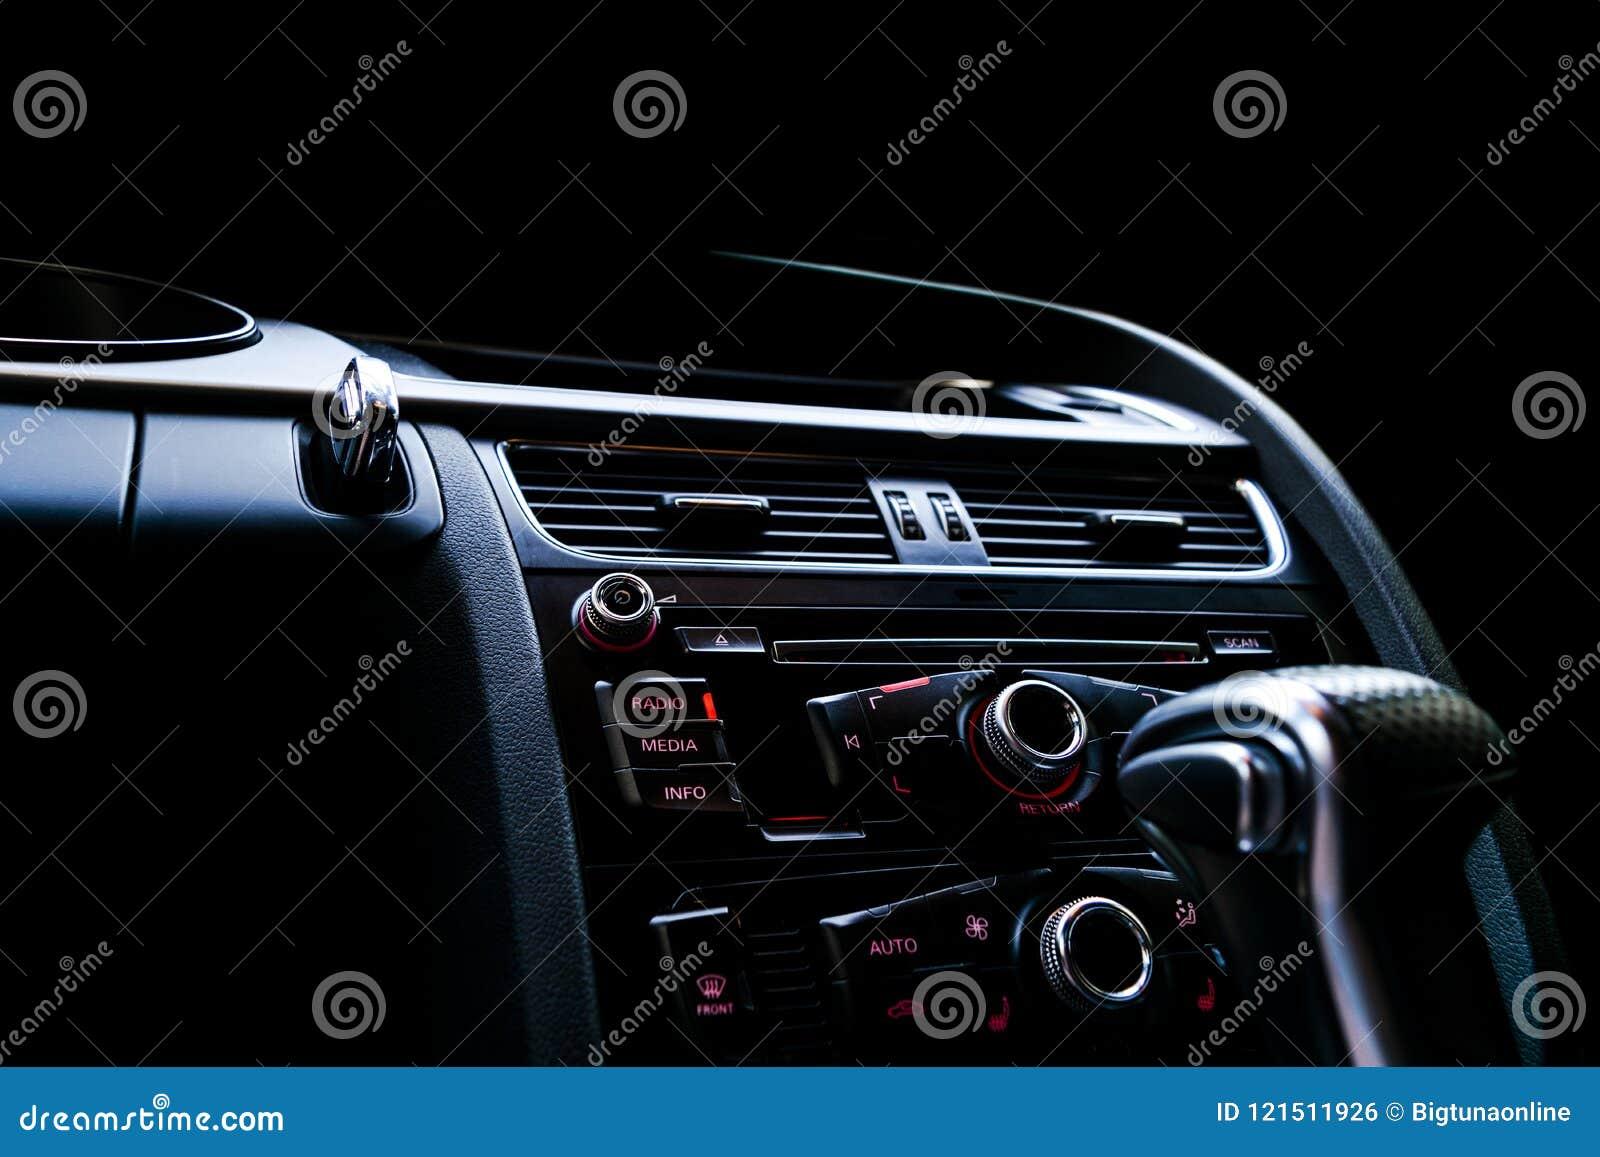 Modern Luxury sport car inside. Interior of prestige car. Black Leather. Car detailing. Dashboard. Media, climate and navigation c